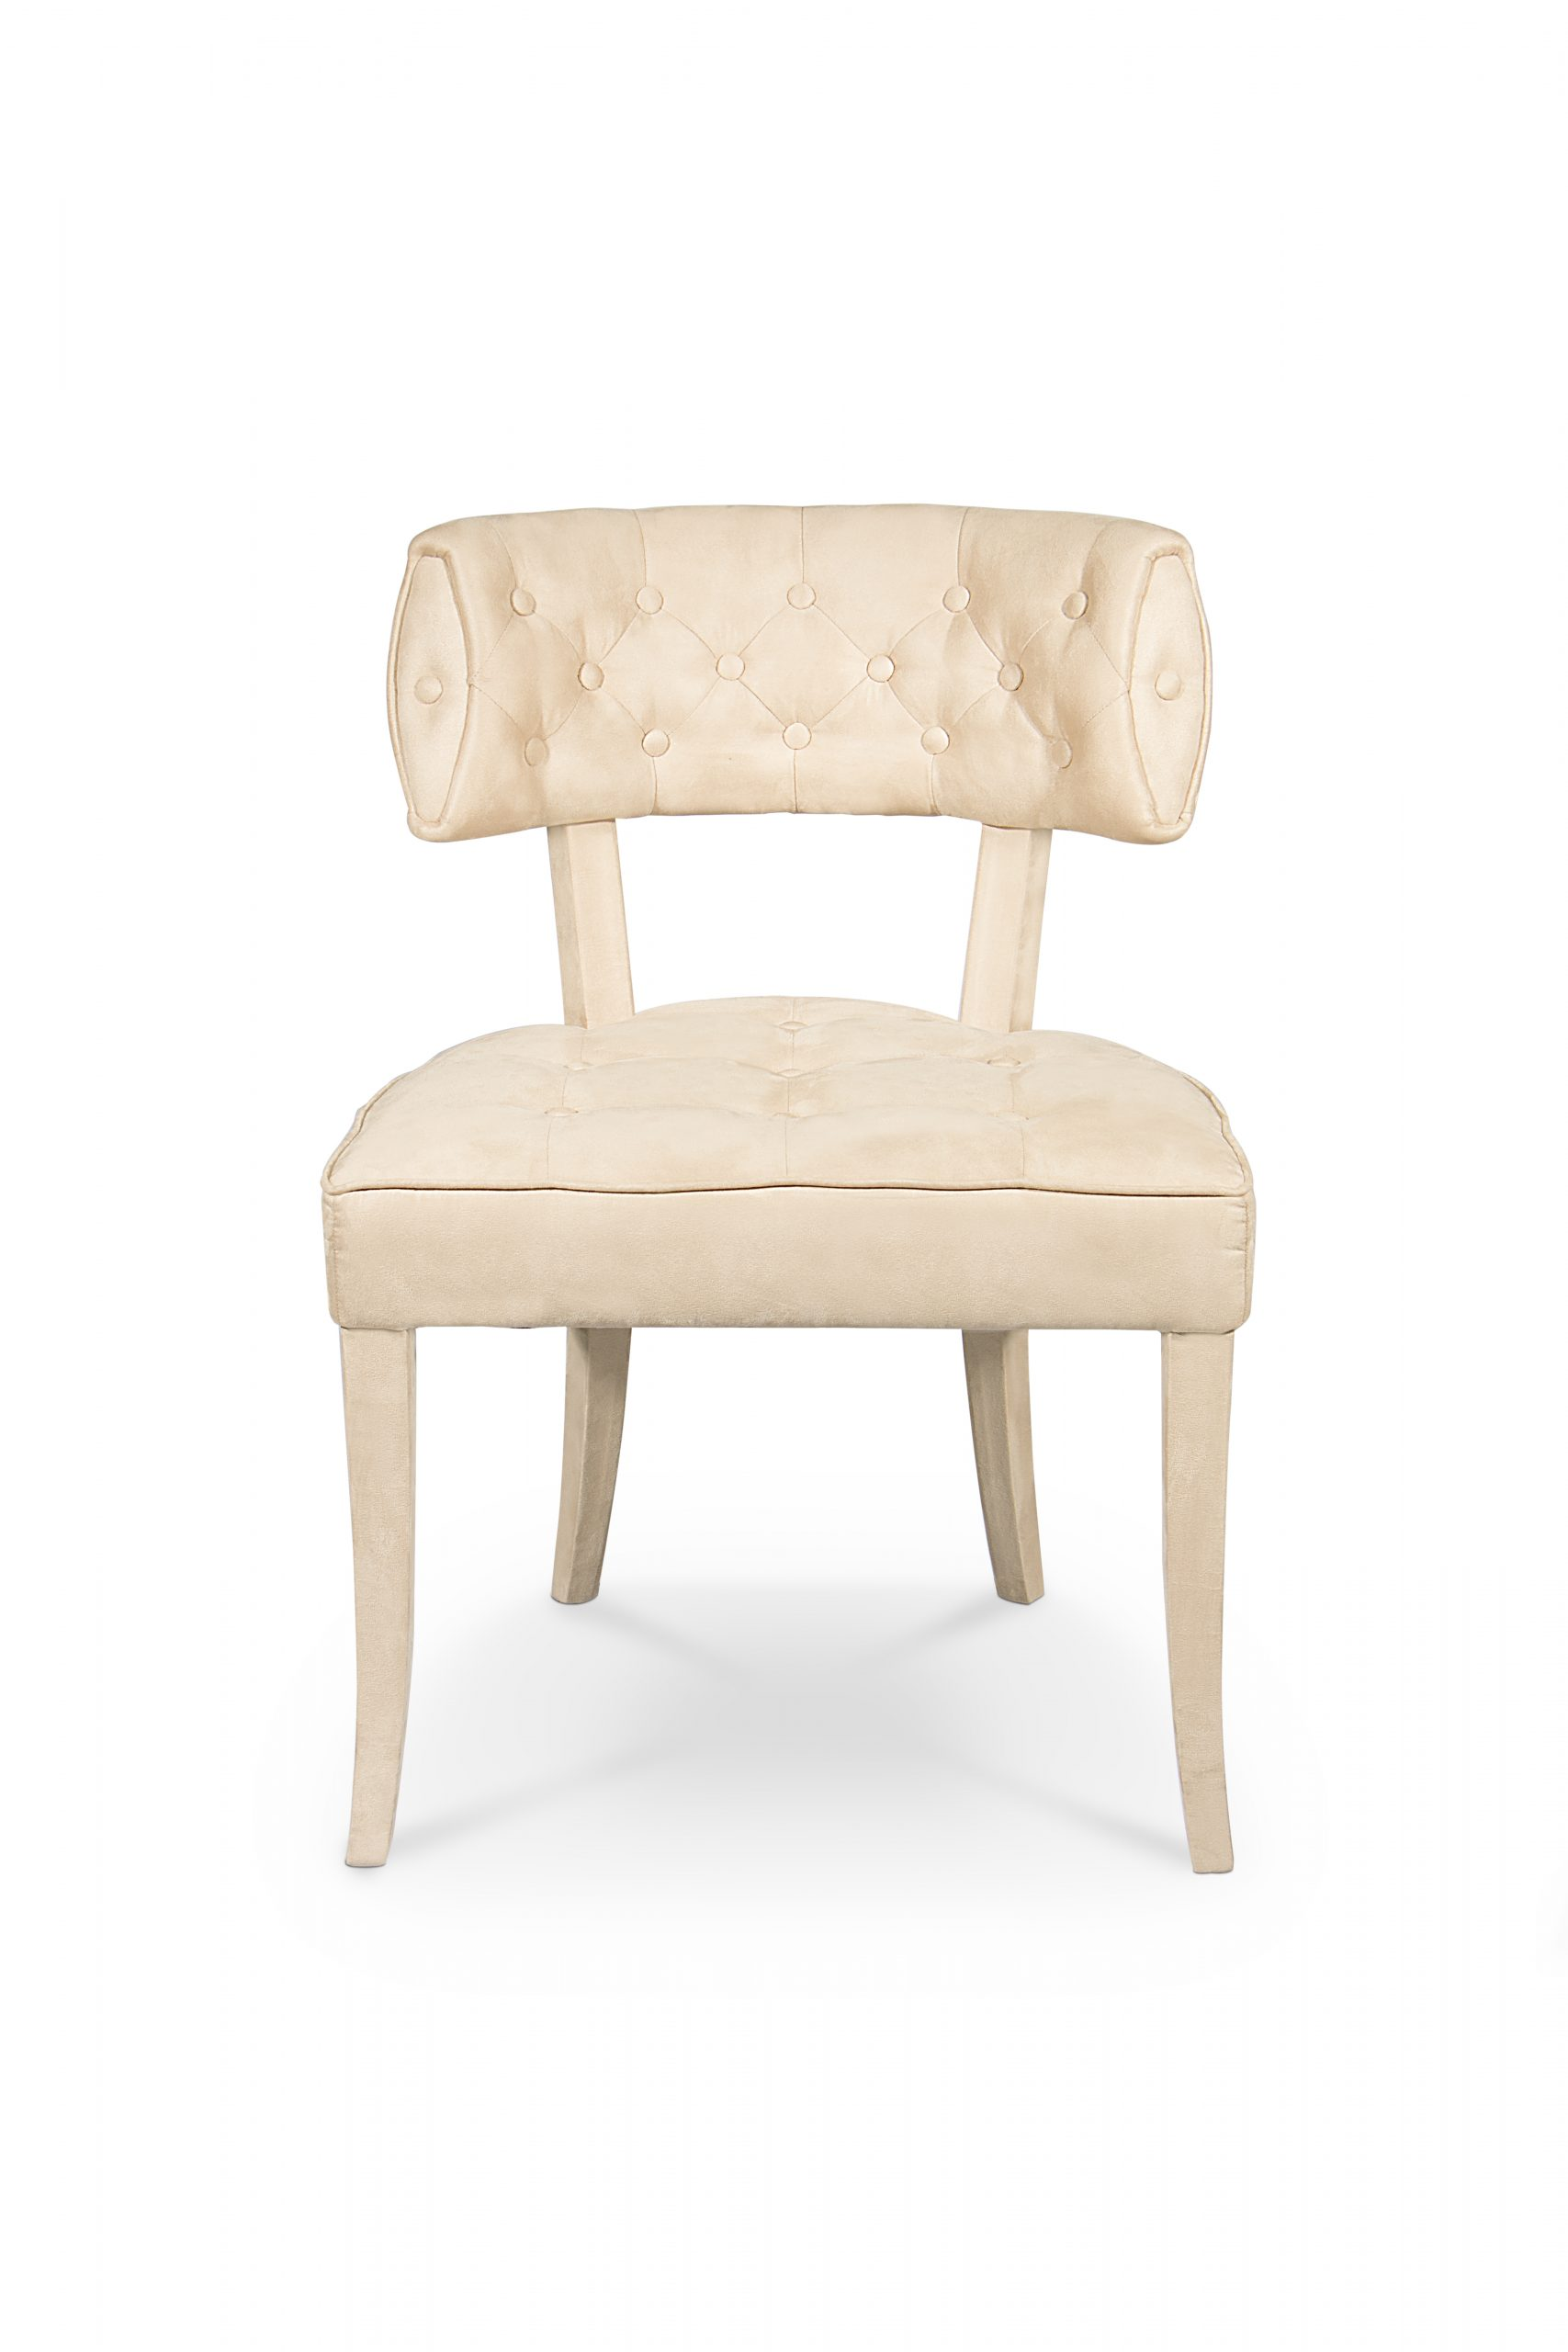 STOLA Dining Chair; Dining Chair; Upholstery; Modern; Sophistication; Elegance; Classiness; Comfort; Fierceness; BRABBU; Design; Furniture stola dining chairSTOLA Dining Chair: A Symbol of Elegance and Sophisticationzulu dining chair 1 scaled